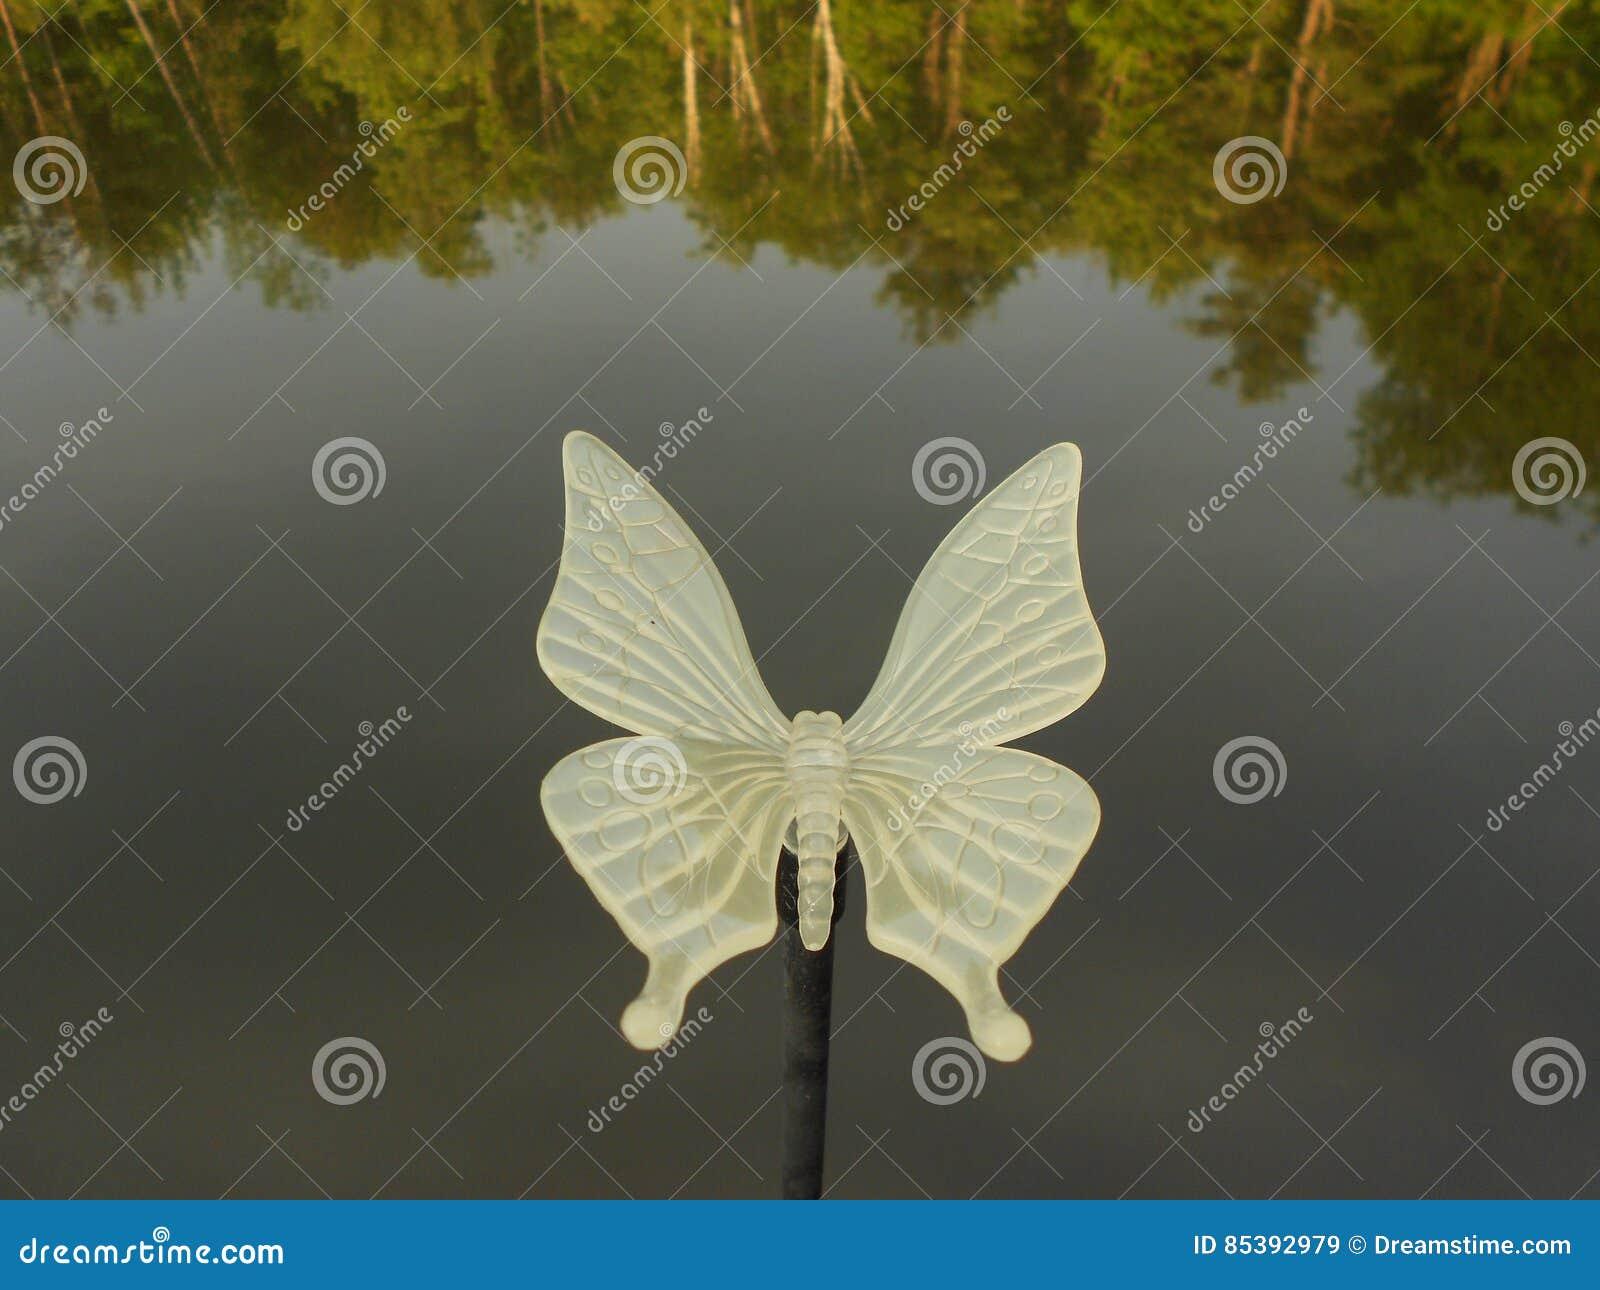 Butterfly lawn ornaments - Butterfly Lawn Ornament